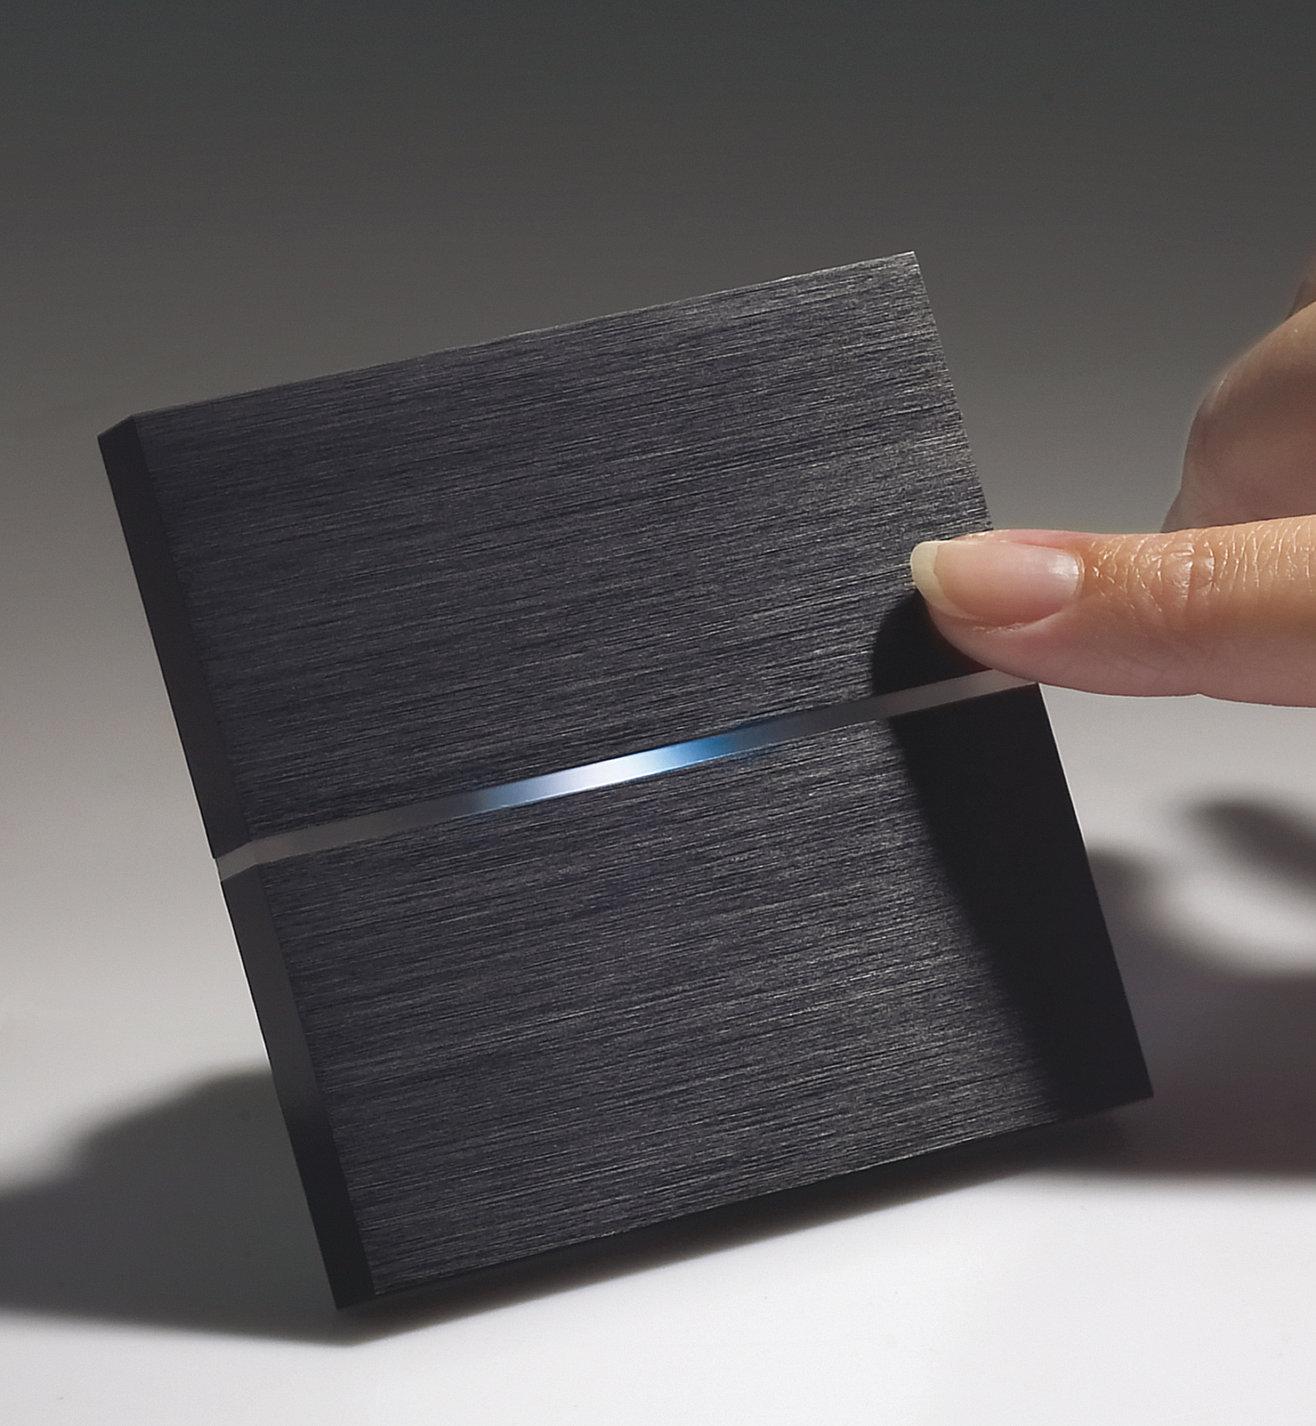 Sentido Schalter | Red Dot Design Award